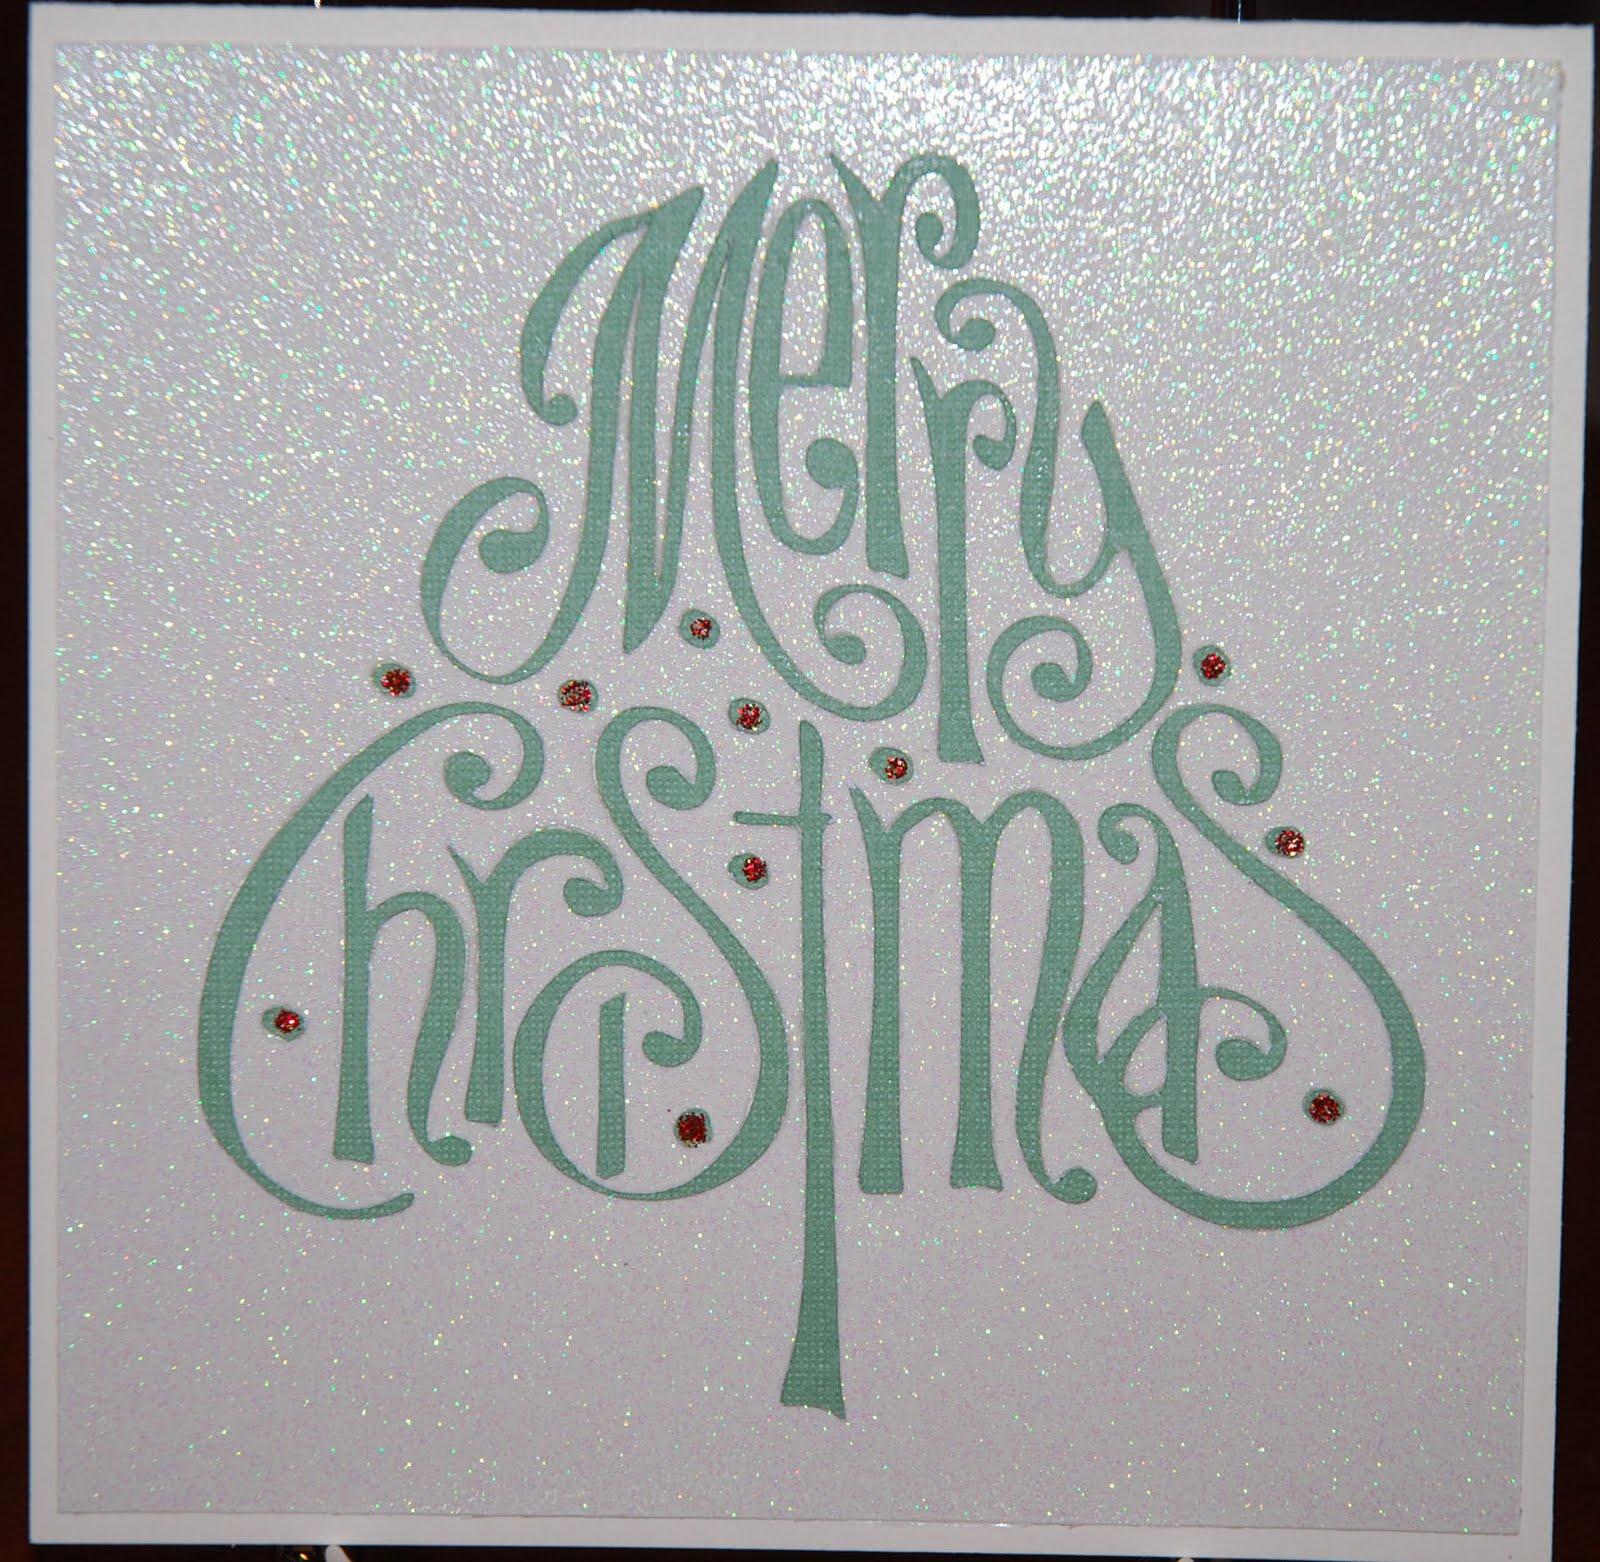 99 days til christmas fancy merry christmas - Fancy Christmas Cards